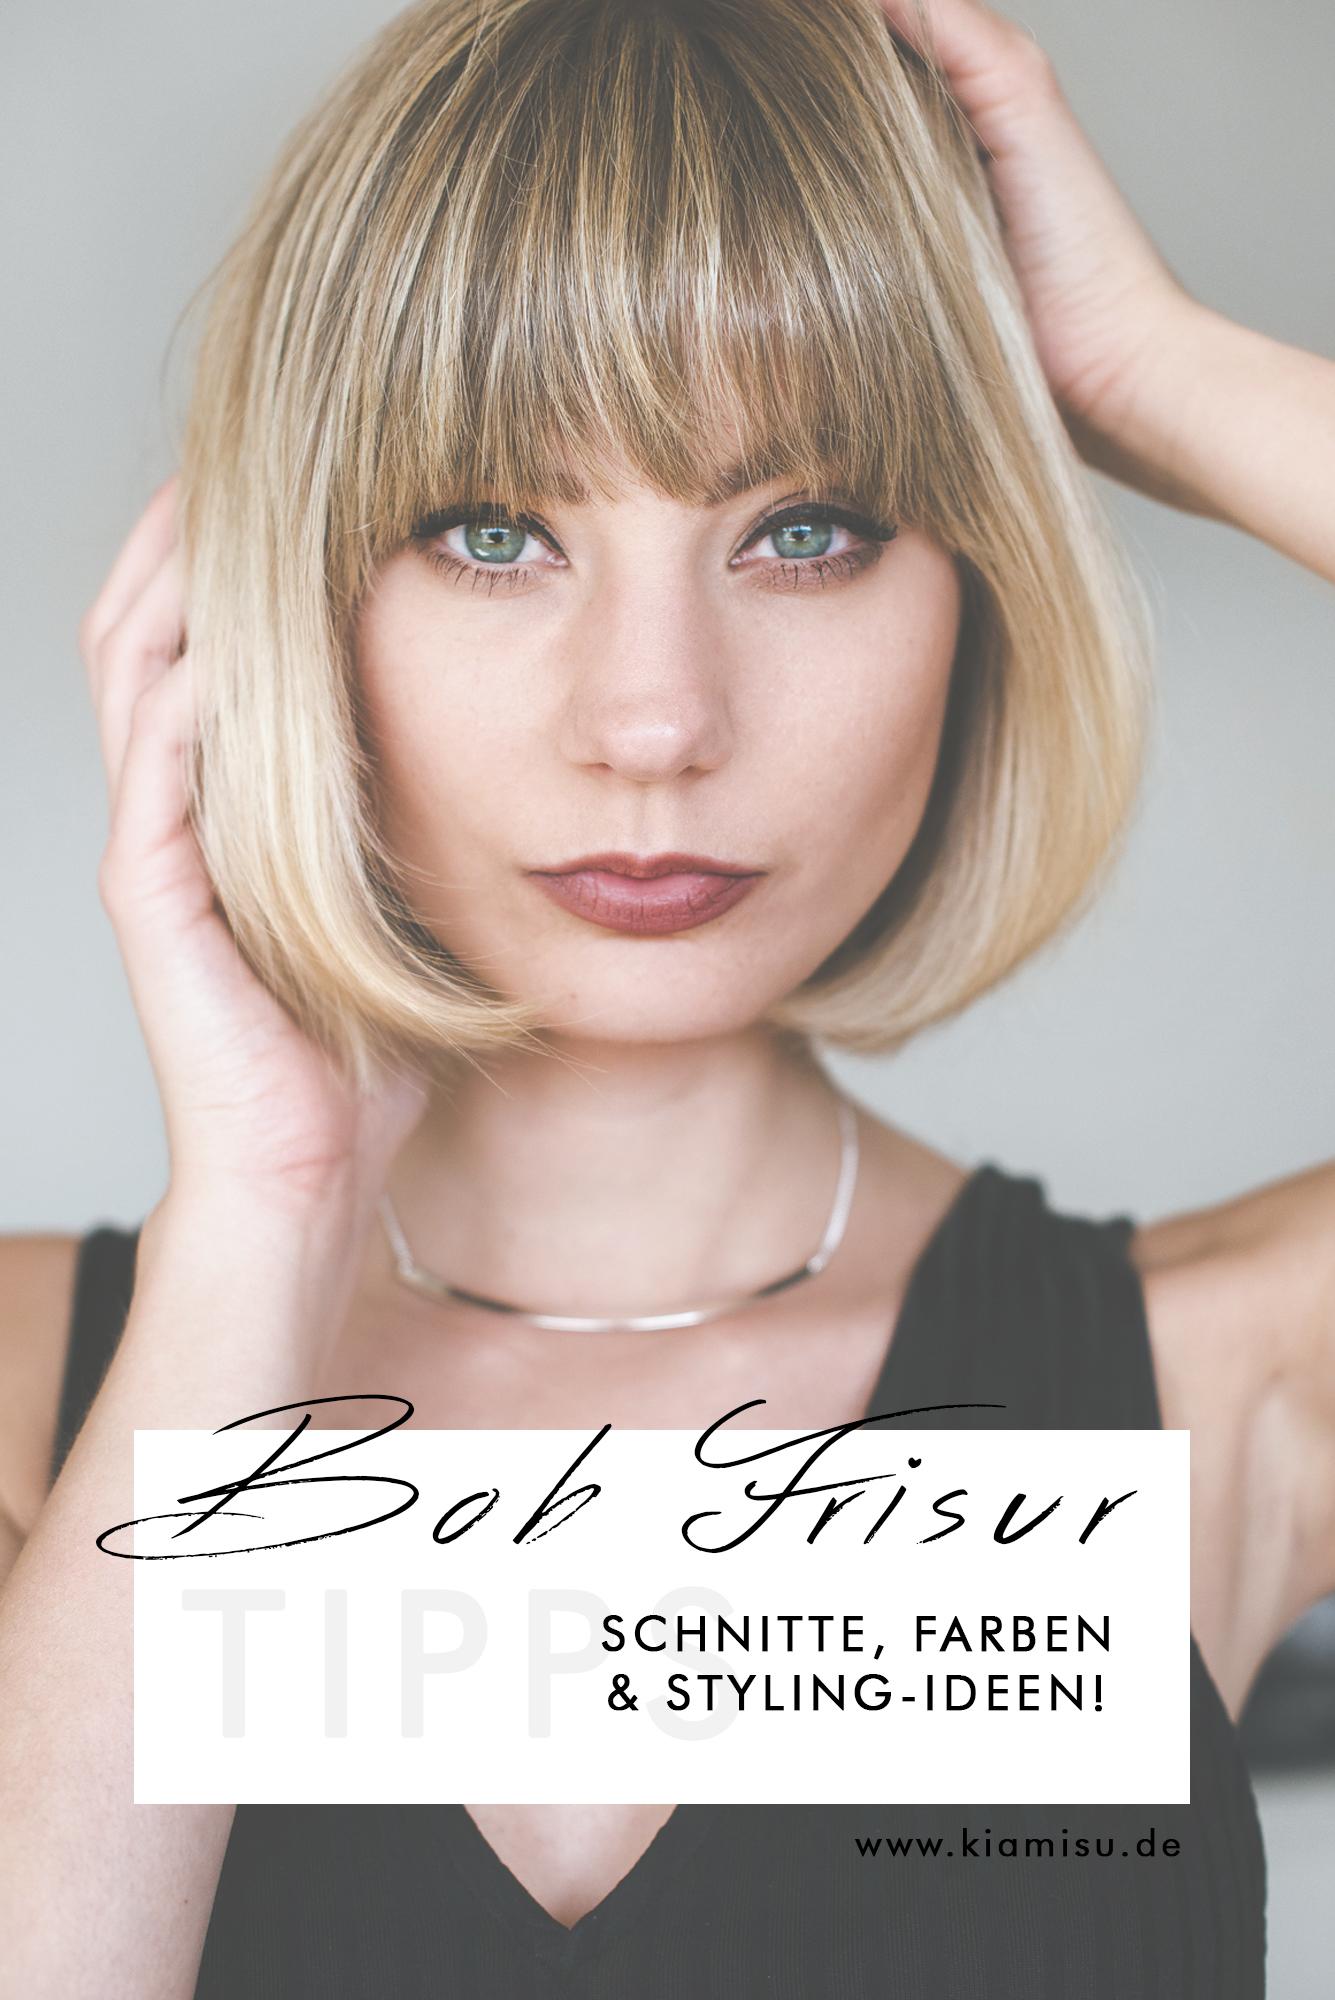 Bob Frisur_ Bob Frisur stylen_Bob frisur tipps_bob frisur trend_Schnitte_Farben_Styling Ideen_Kiamisu_Modeblog-Final1